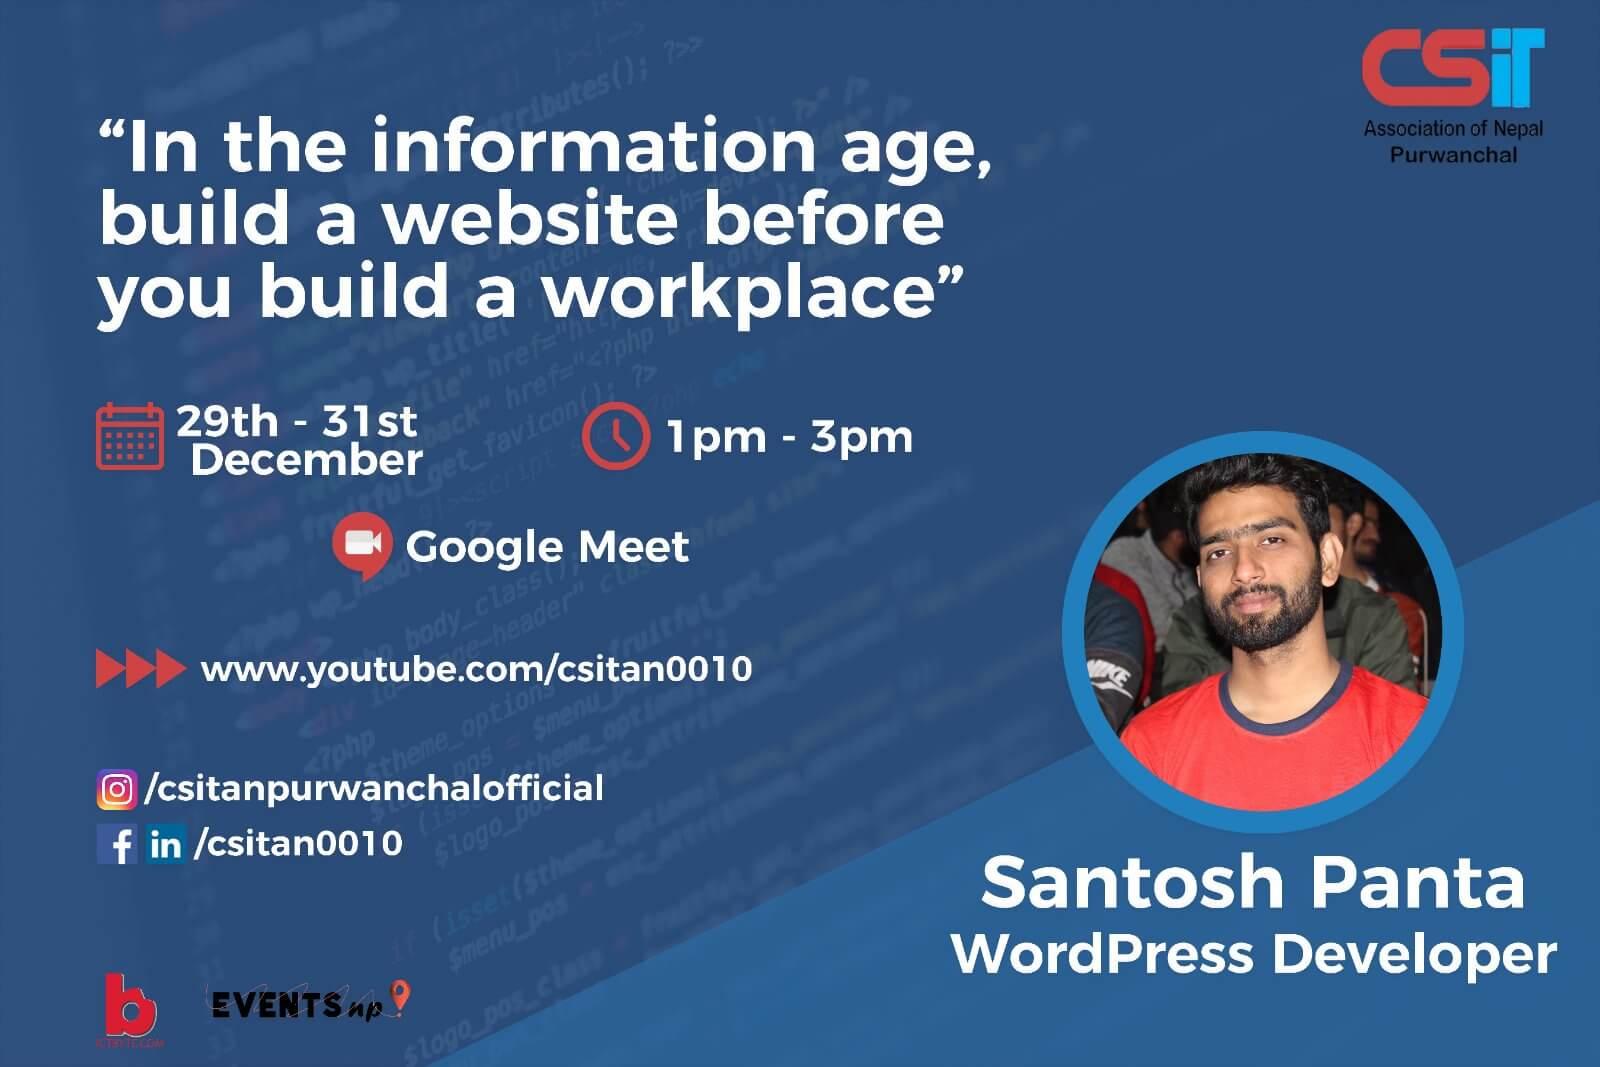 santosh panta WordPress